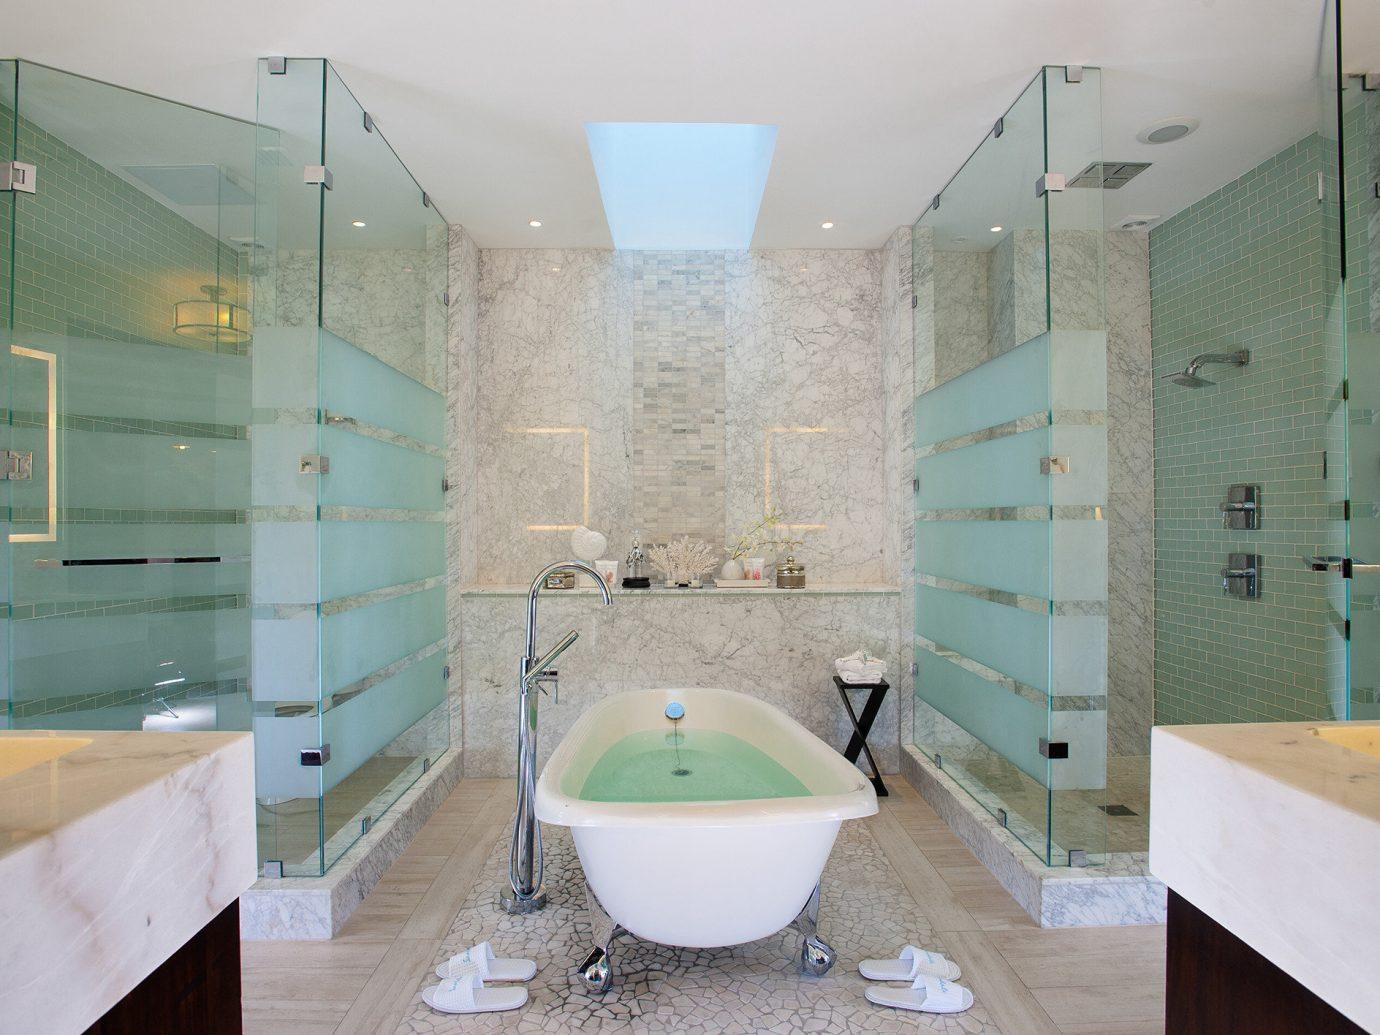 All-Inclusive Resorts caribbean indoor bathroom wall sink room interior design Architecture glass home tile floor plumbing fixture estate daylighting ceiling angle interior designer window Bath